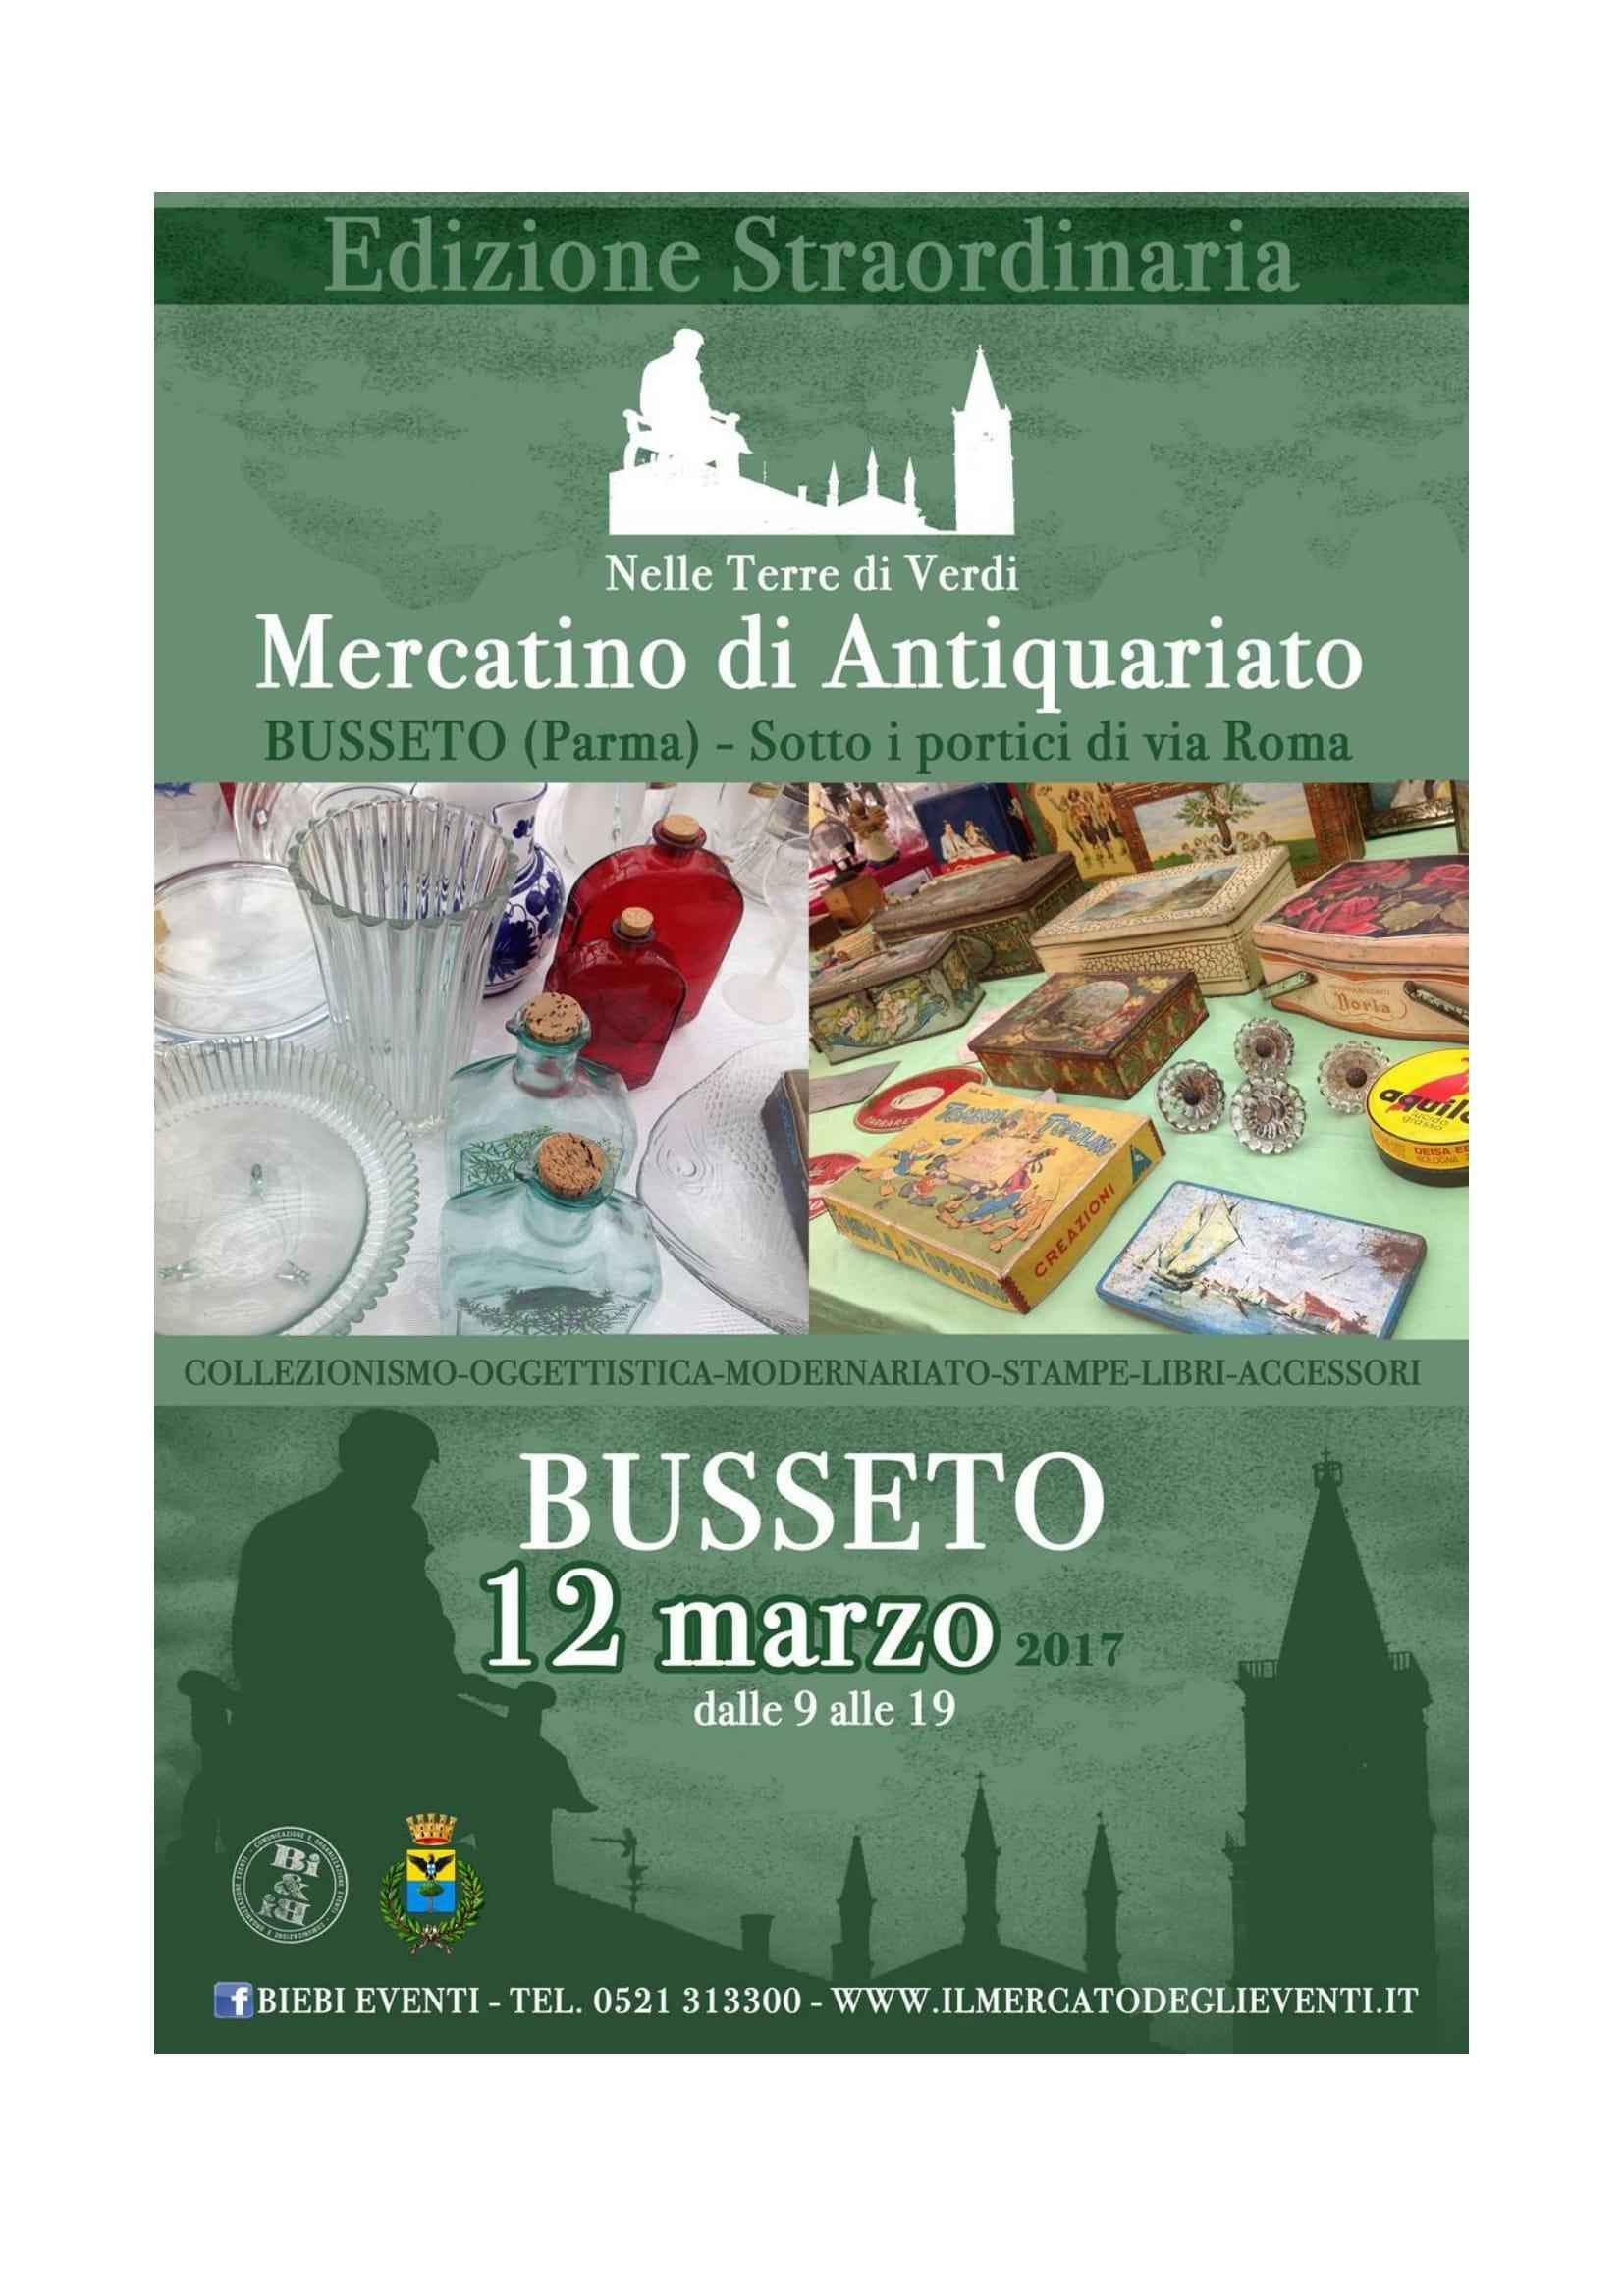 Mercatino di antiquariato busseto live it for Mercatino antiquariato